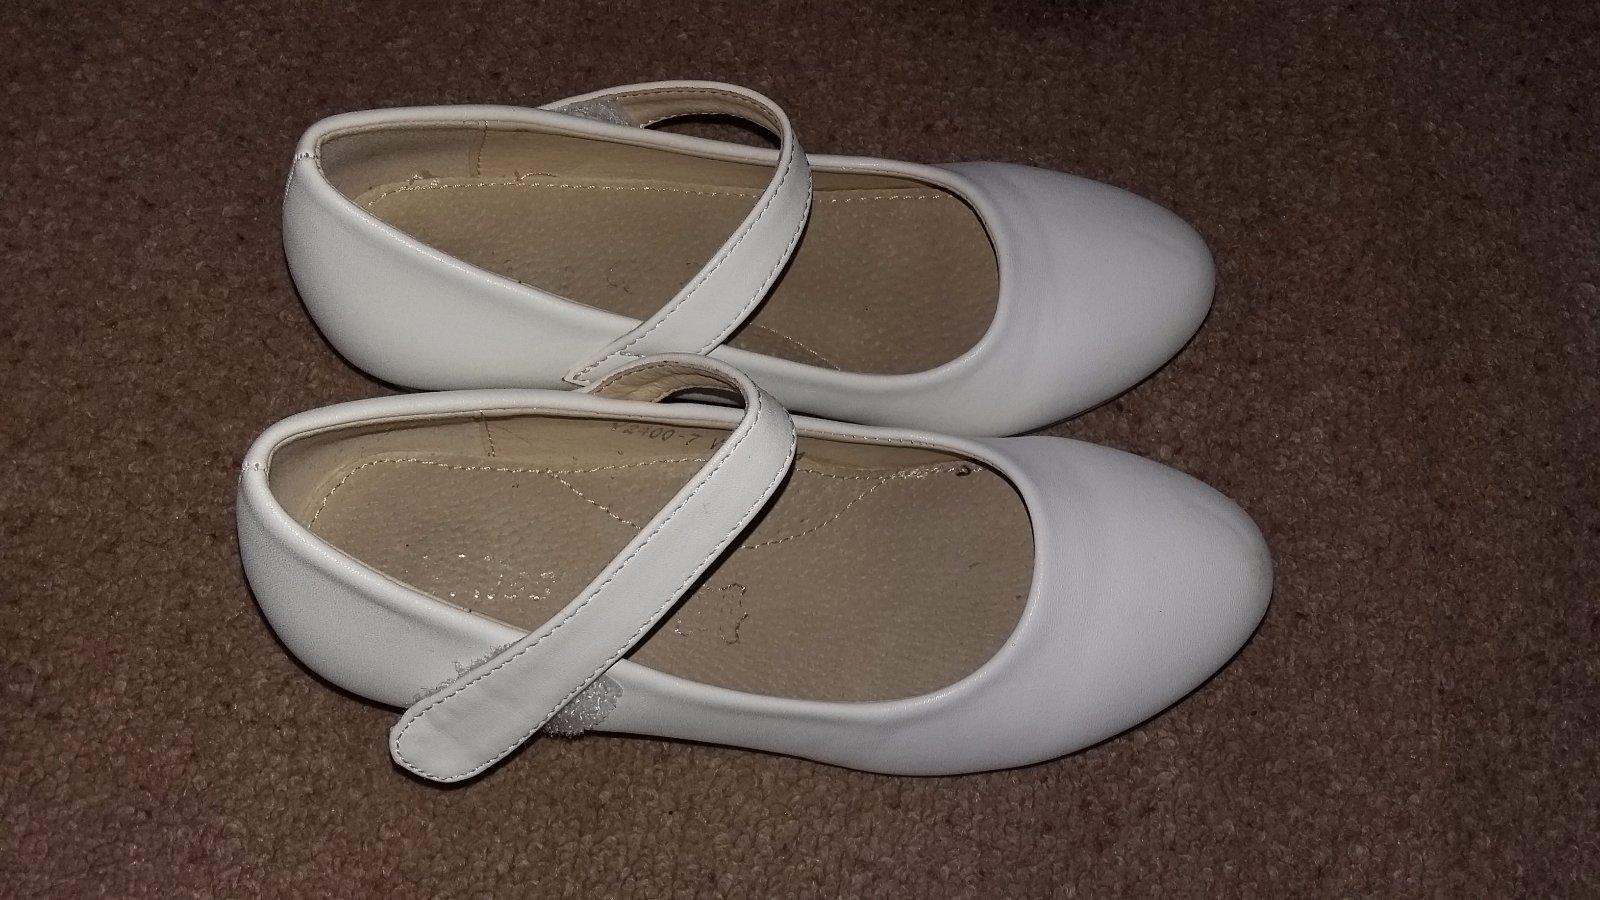 e97f52feb1 Biele topánky na svadbu